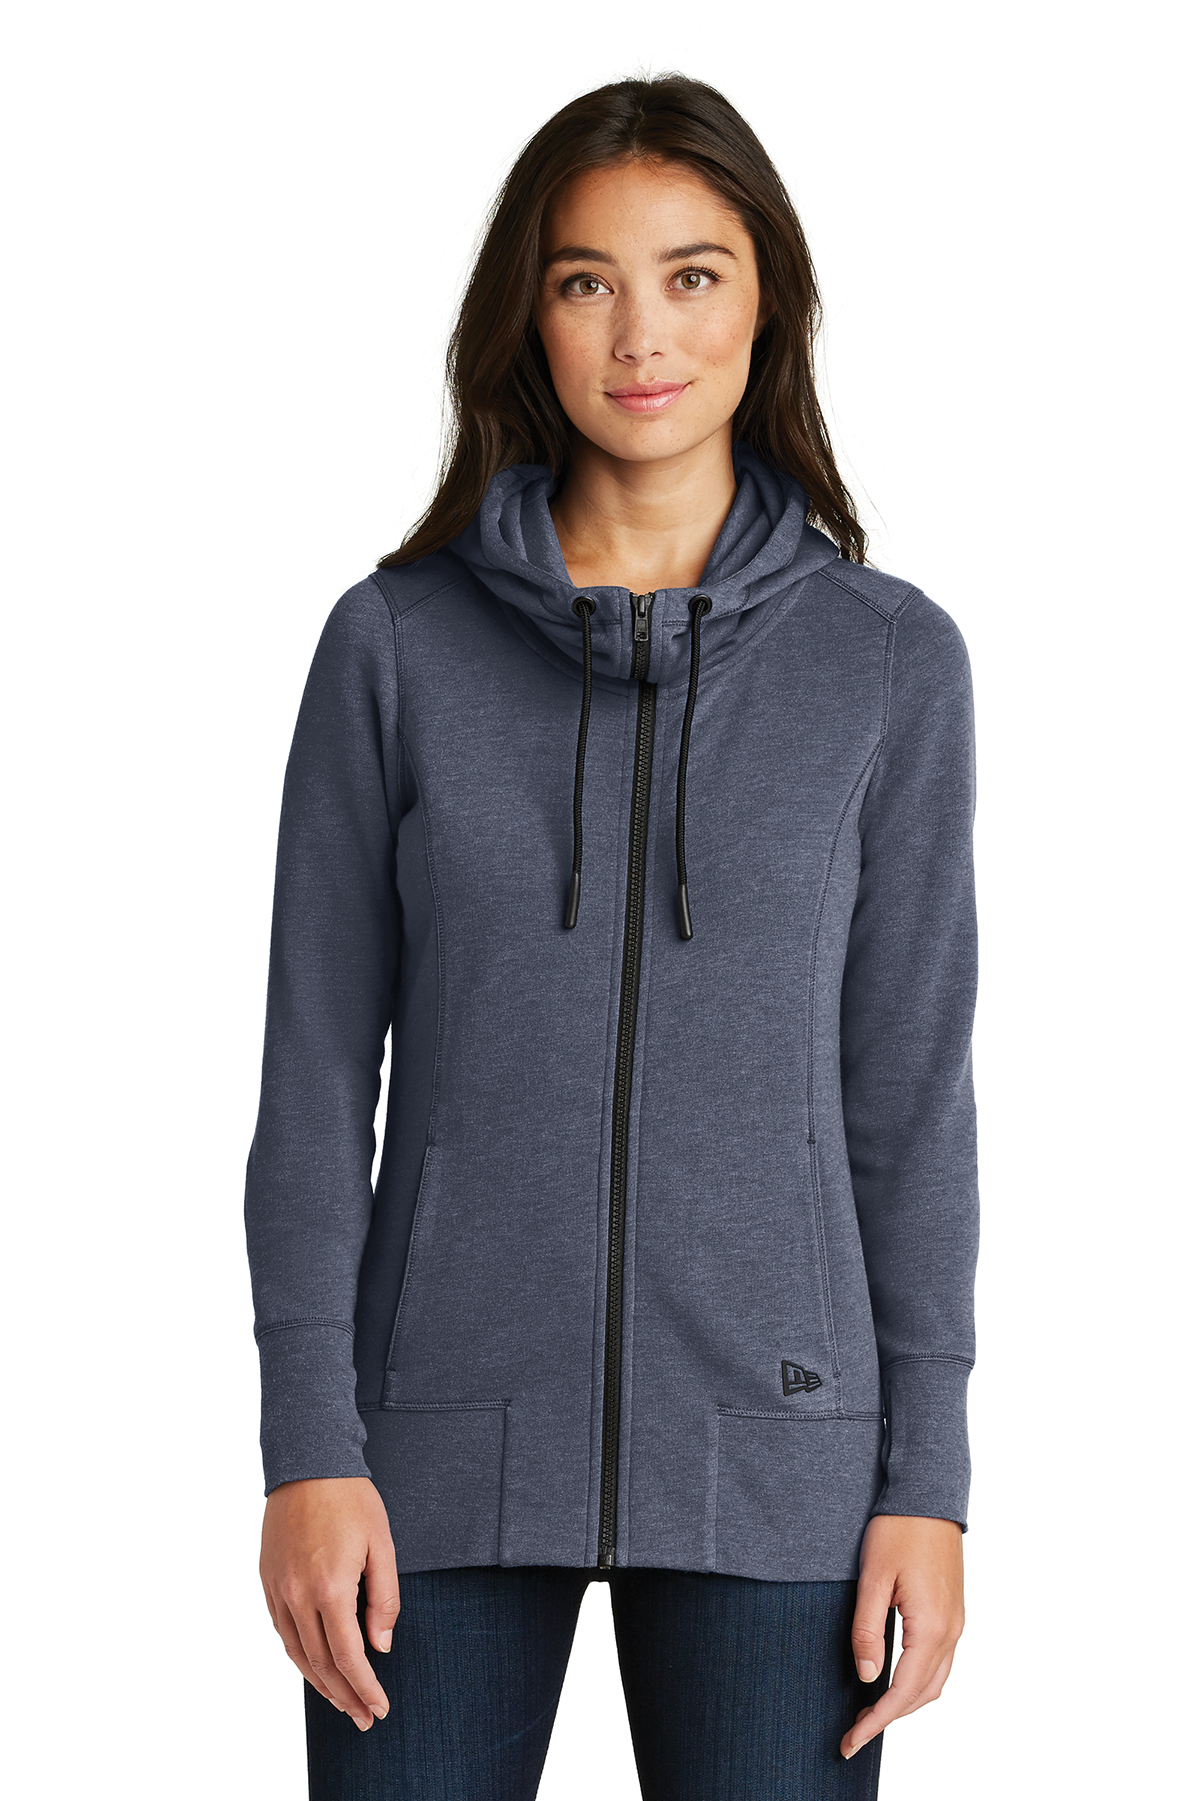 New Era LNEA511 - Ladies Tri-Blend Fleece Full Zip Hoodie